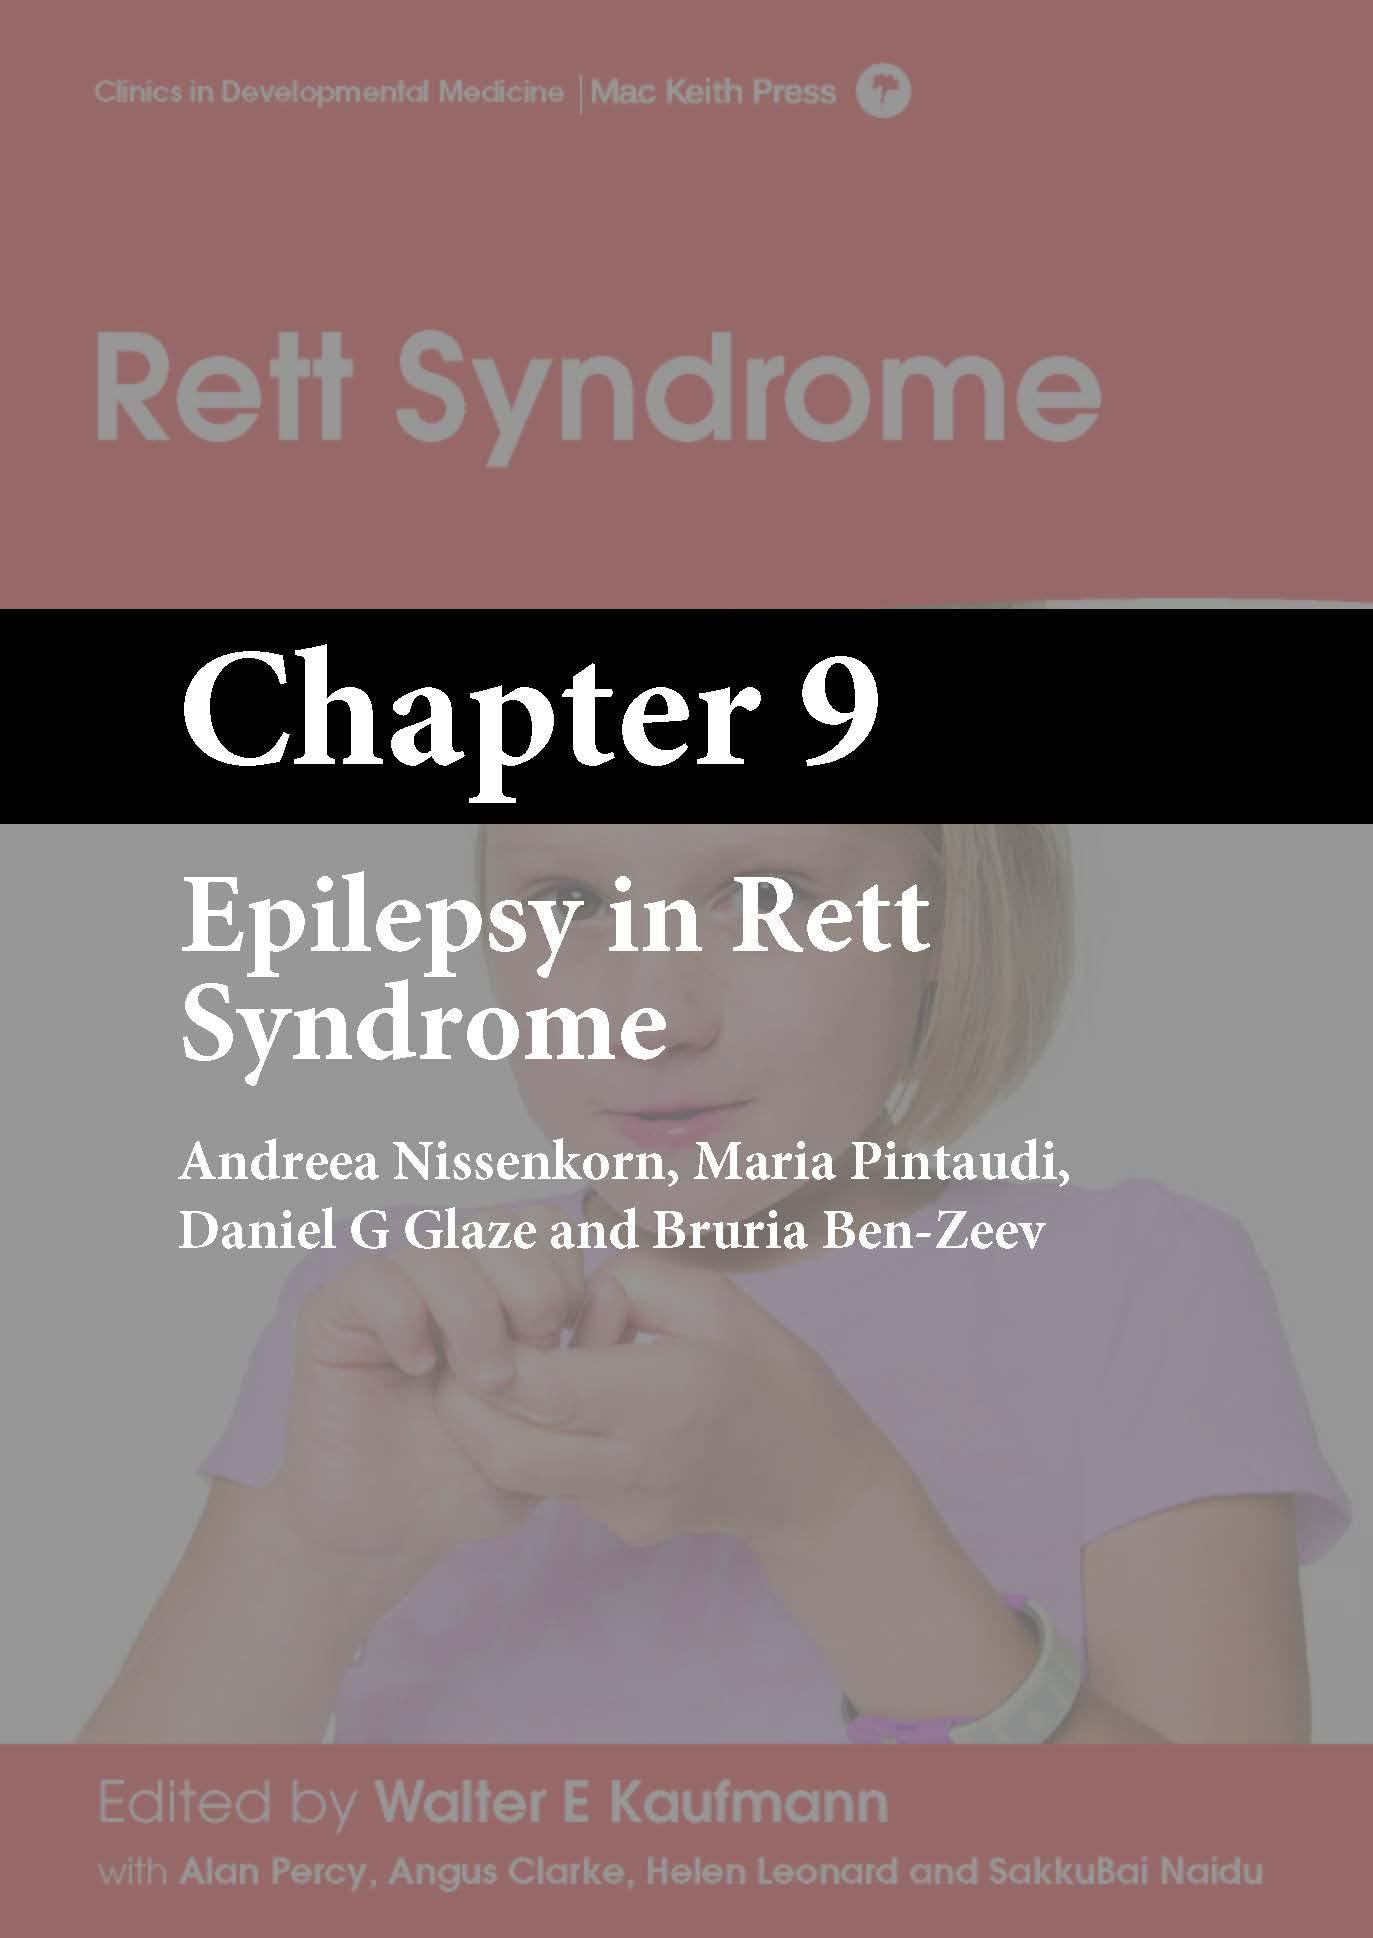 Rett Syndrome, Kaufmann, Chapter 9 cover